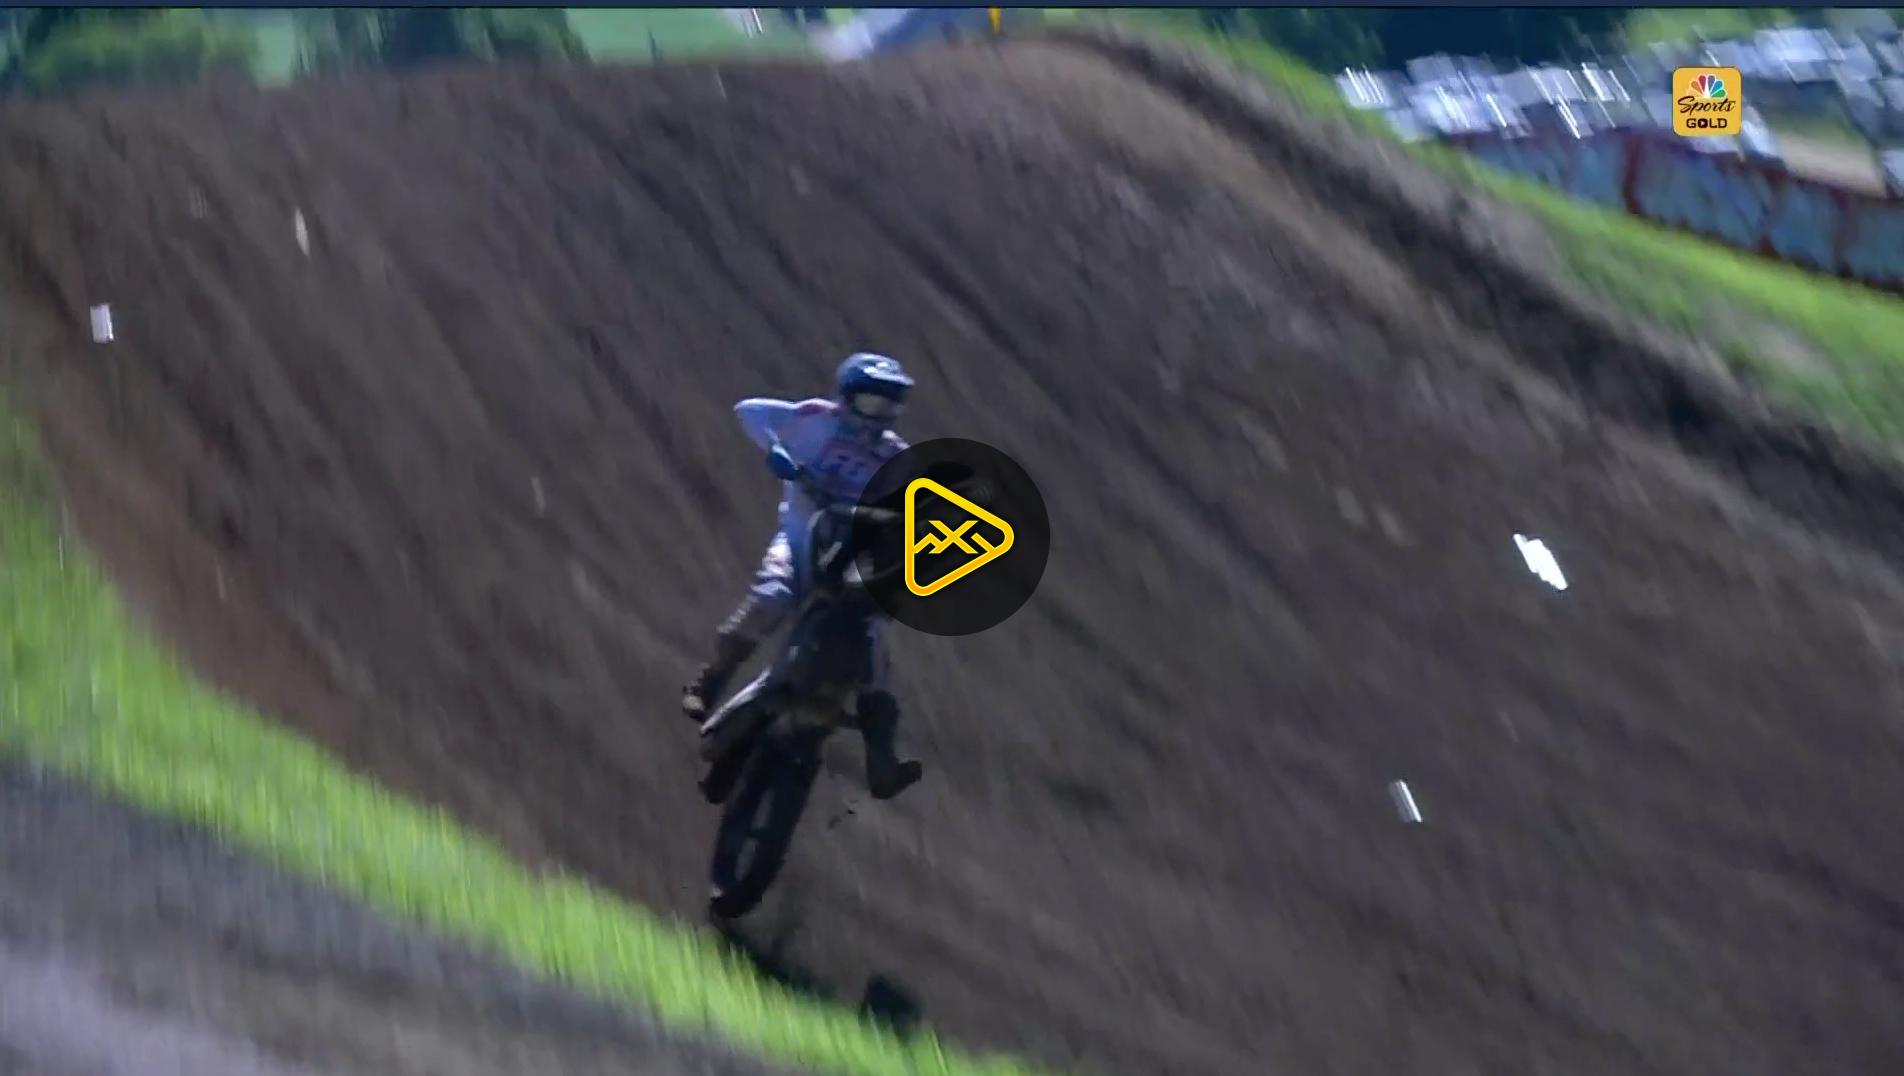 Jake Masterpool Crash Off Larocco's Leap